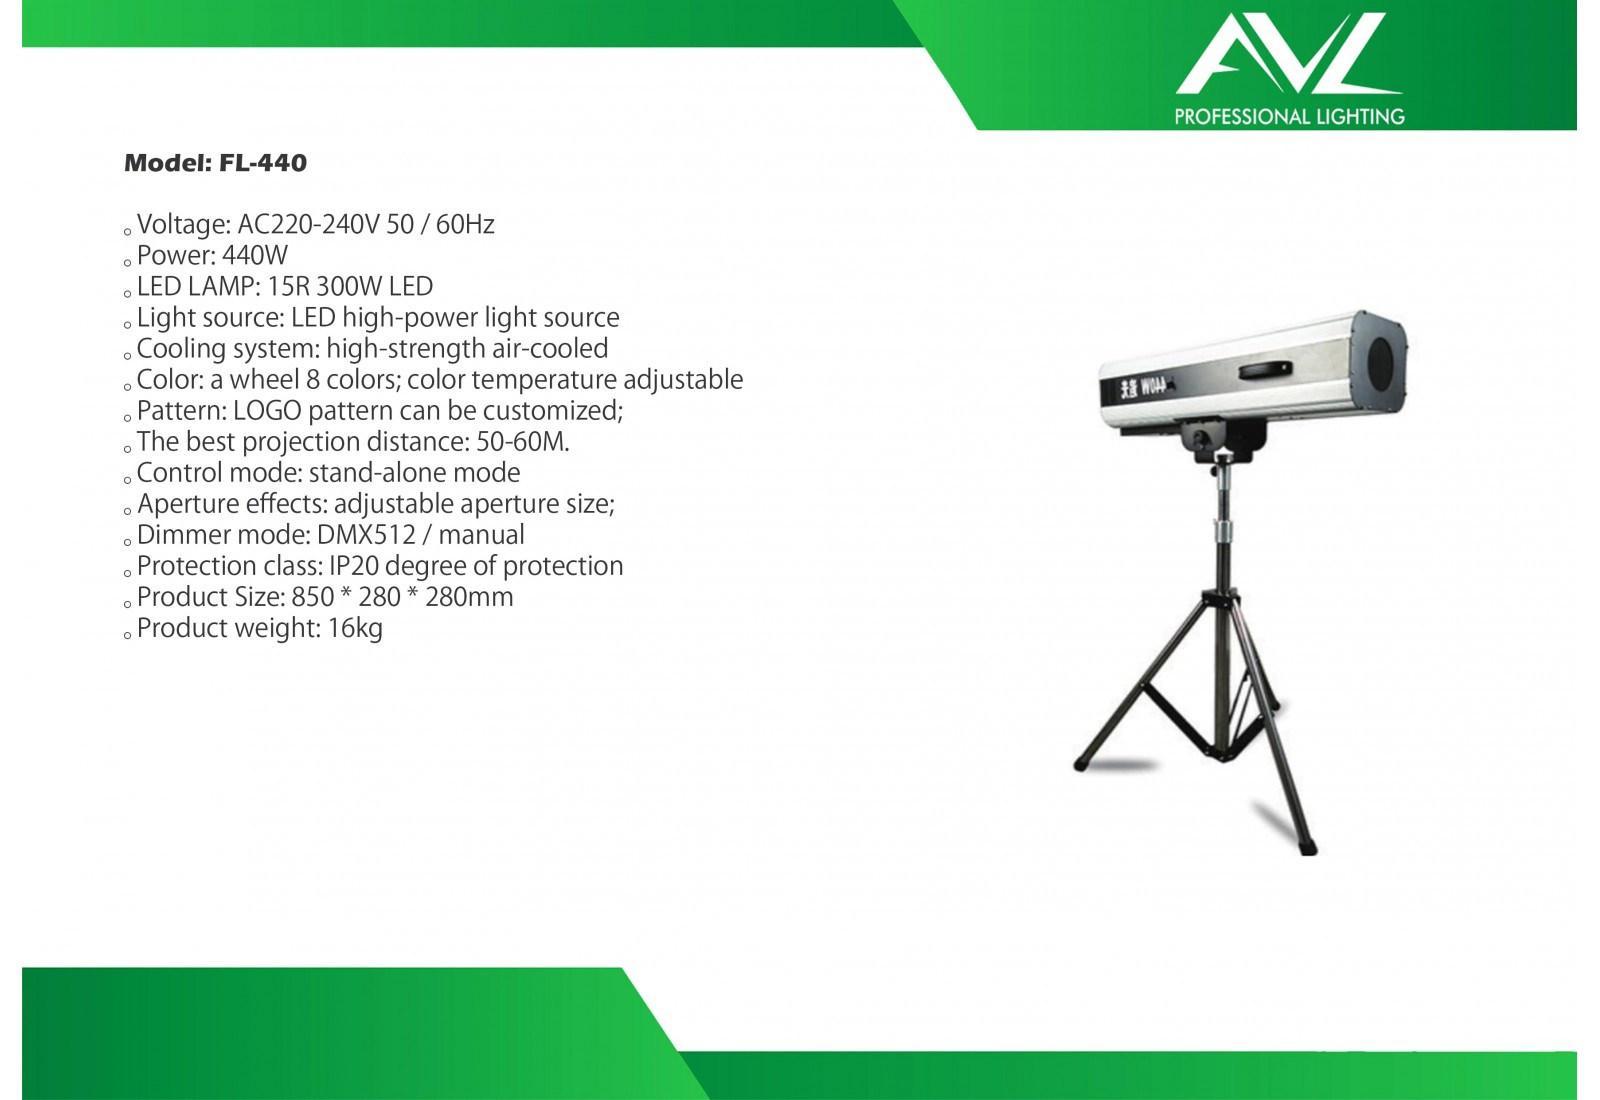 AVL FL 440